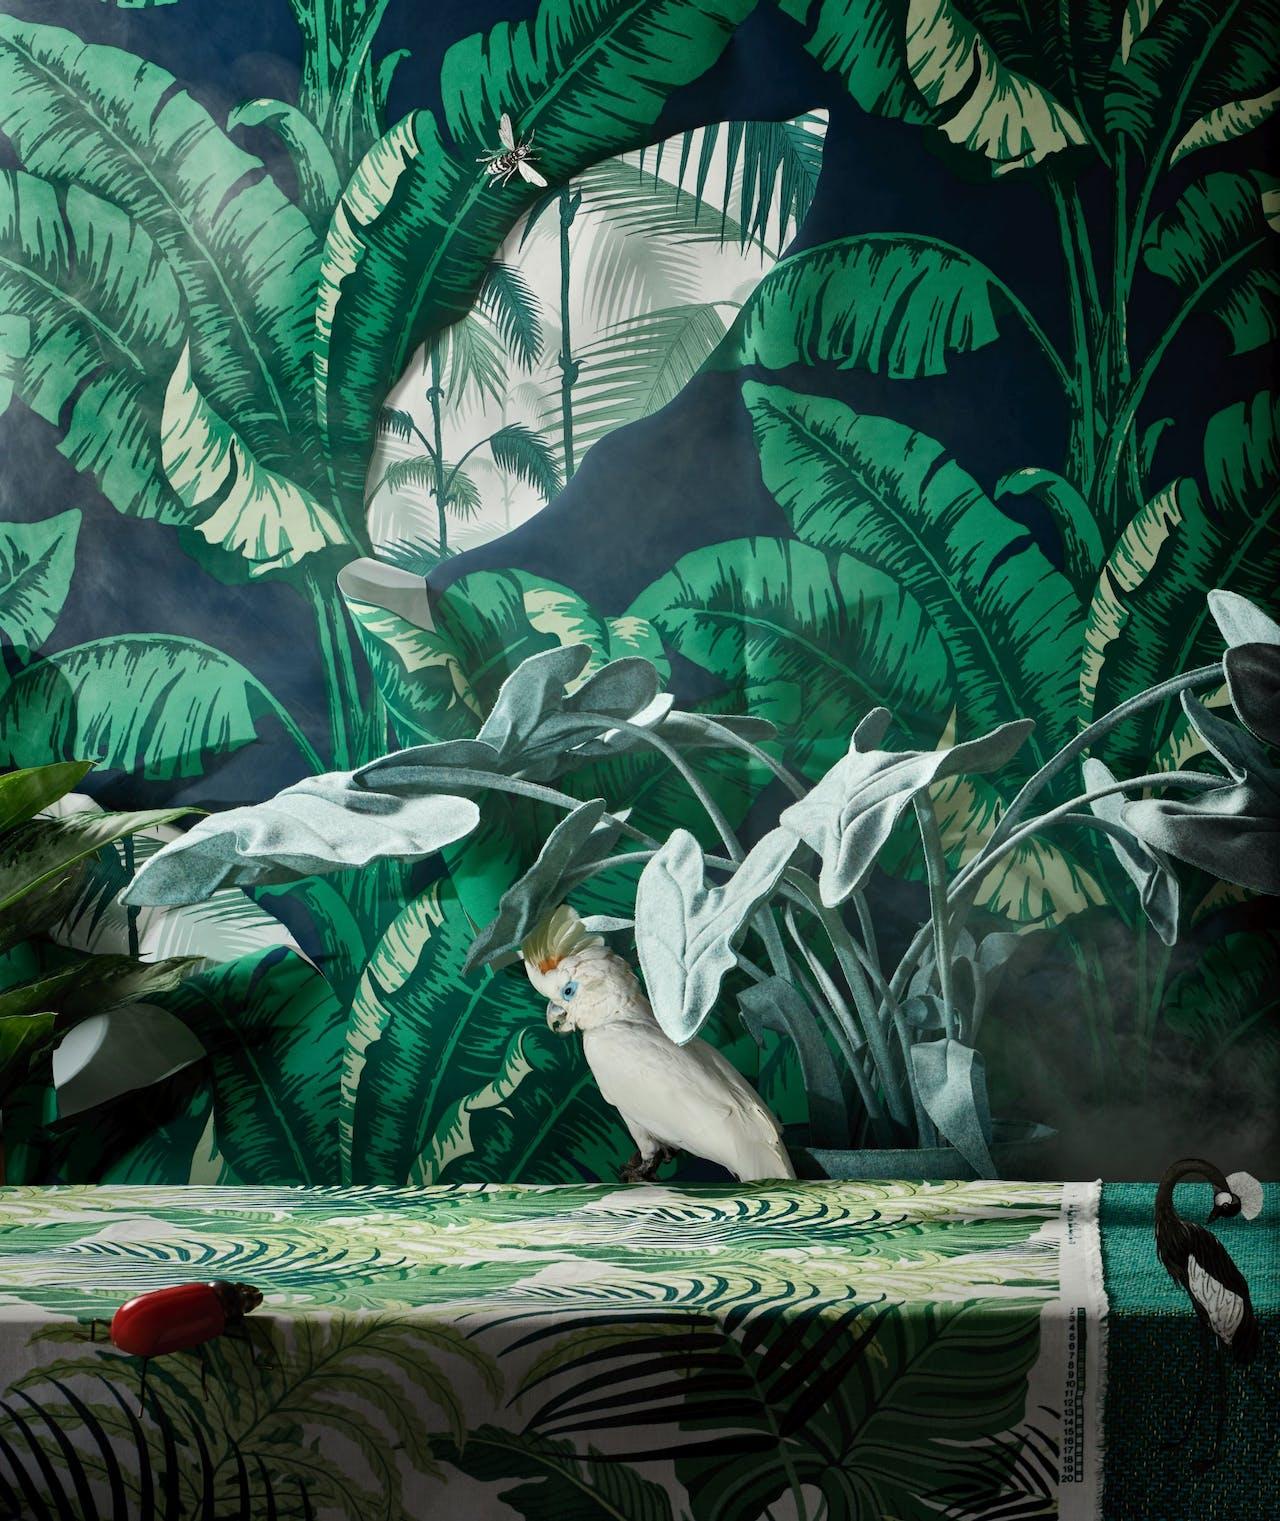 Behang op achtergrond 'La Havane', € 166 p/rol, Nobilis via Wilhelmine van Aerssen; behanguitsnede in palmblad 'Palm Jungle', €124, Cole and Son via Luxury By Nature; plant aglaonema silver bay, mooiwatplantendoen.nl; rode kever, €20, Zara Home; interieurstof 'Manila', €78, Sanderson via Luxury by Nature; kaketoe, €745, Luxury by Nature; vilten plant alocasia in Divina Kvadrat-stof, €1175, Wandschappen; groene stof 'Vanuatu', €99, Pierre Frey via Luxury by Nature.